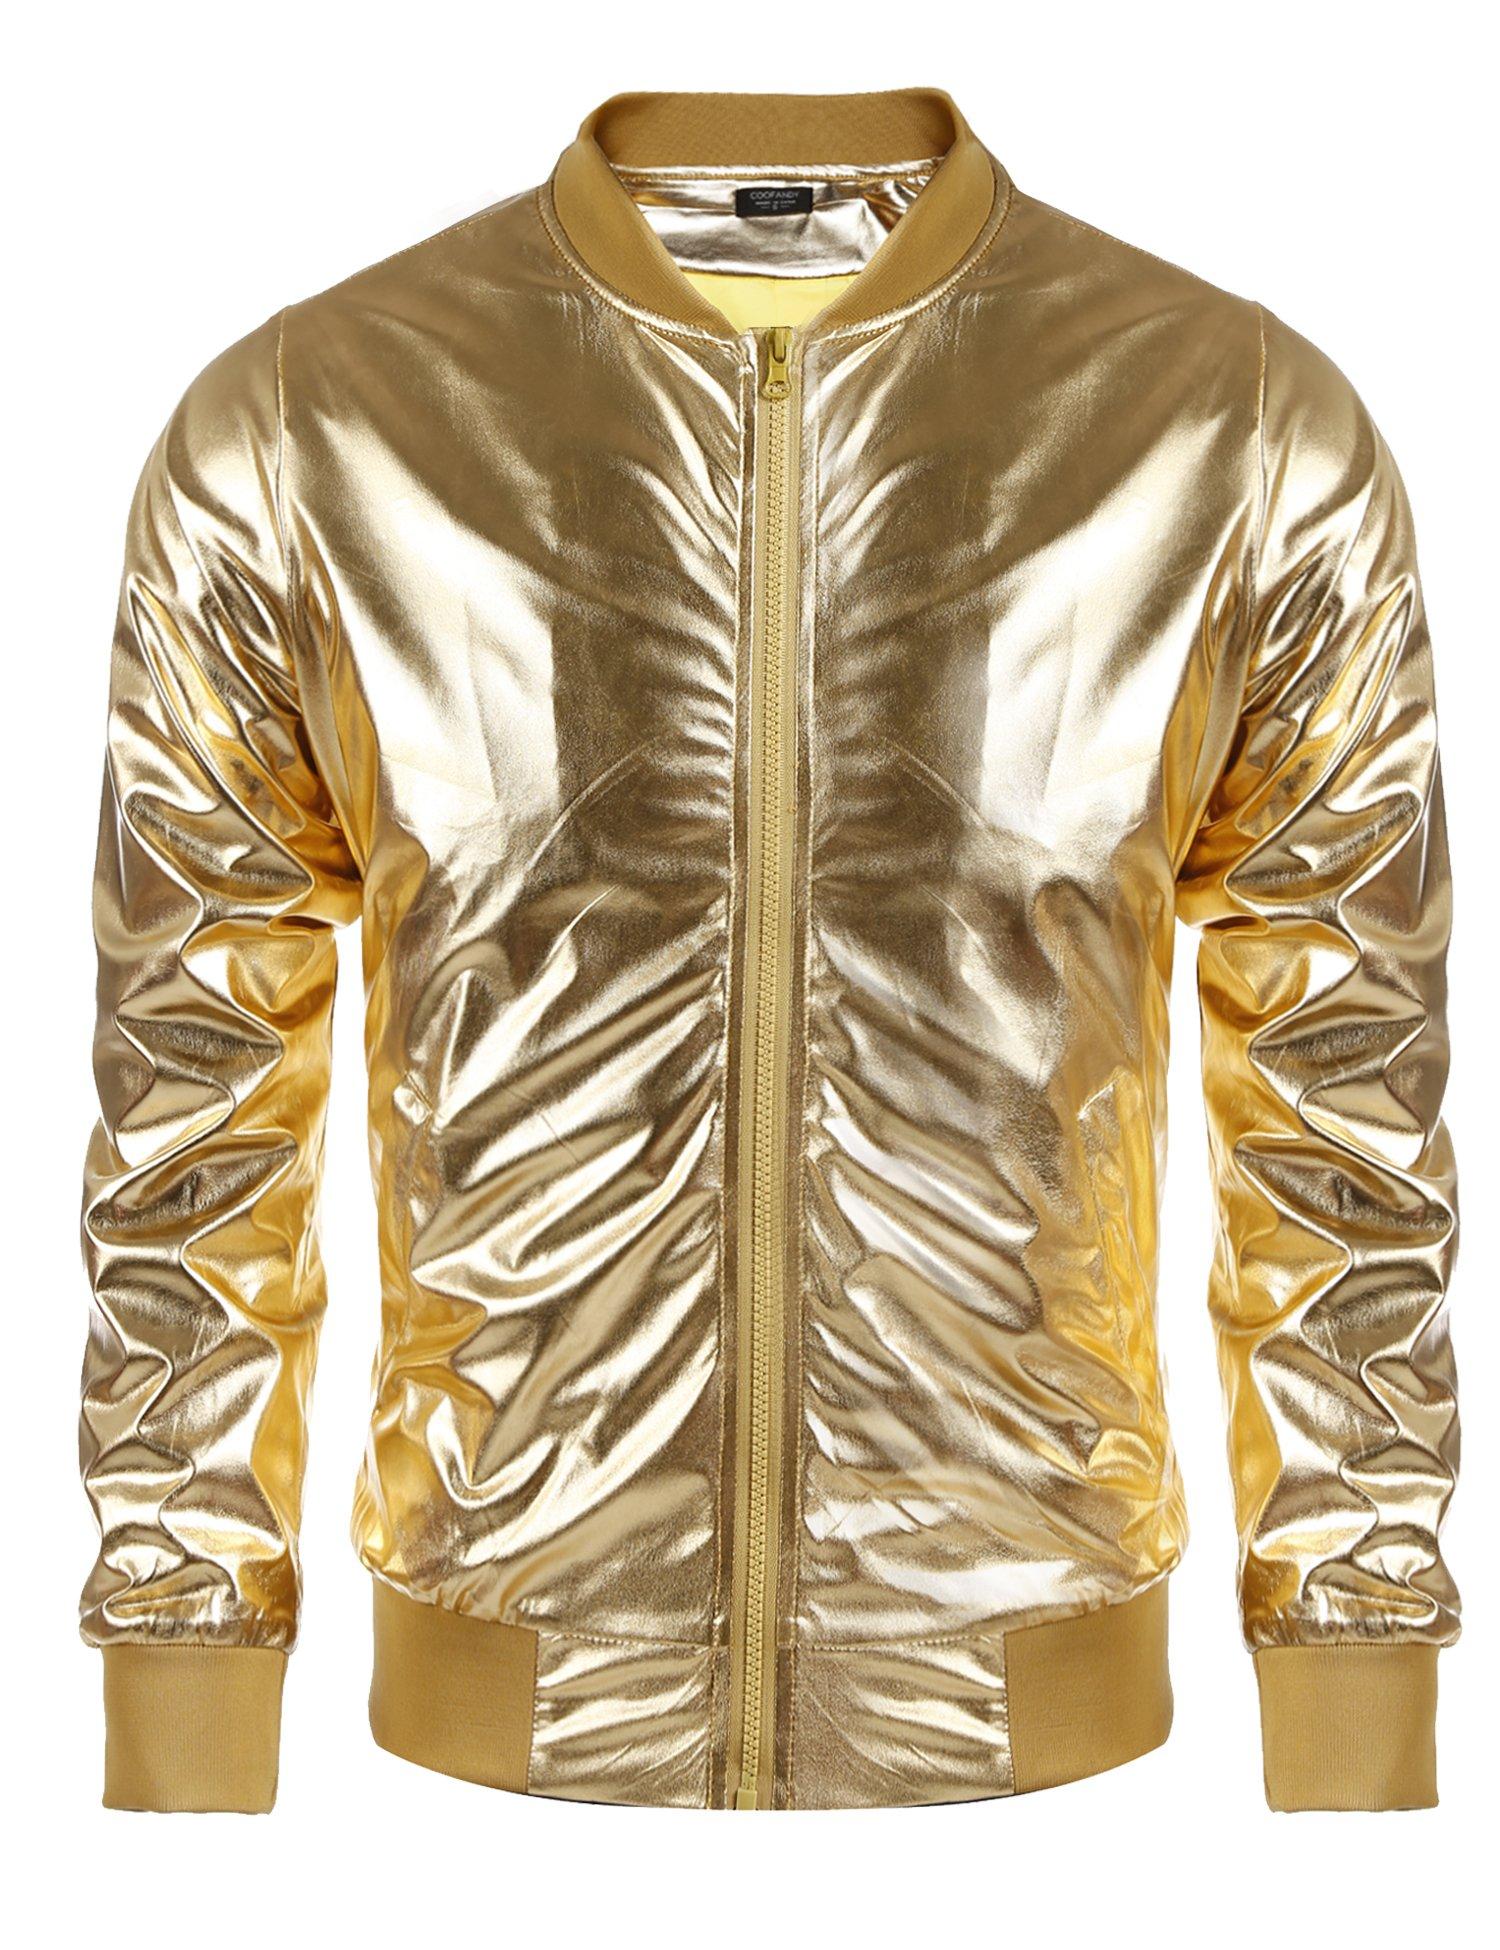 Coofandy Men's Metallic Nightclub Styles Zip Up Varsity Baseball Bomber Jacket,Golden,Small by COOFANDY